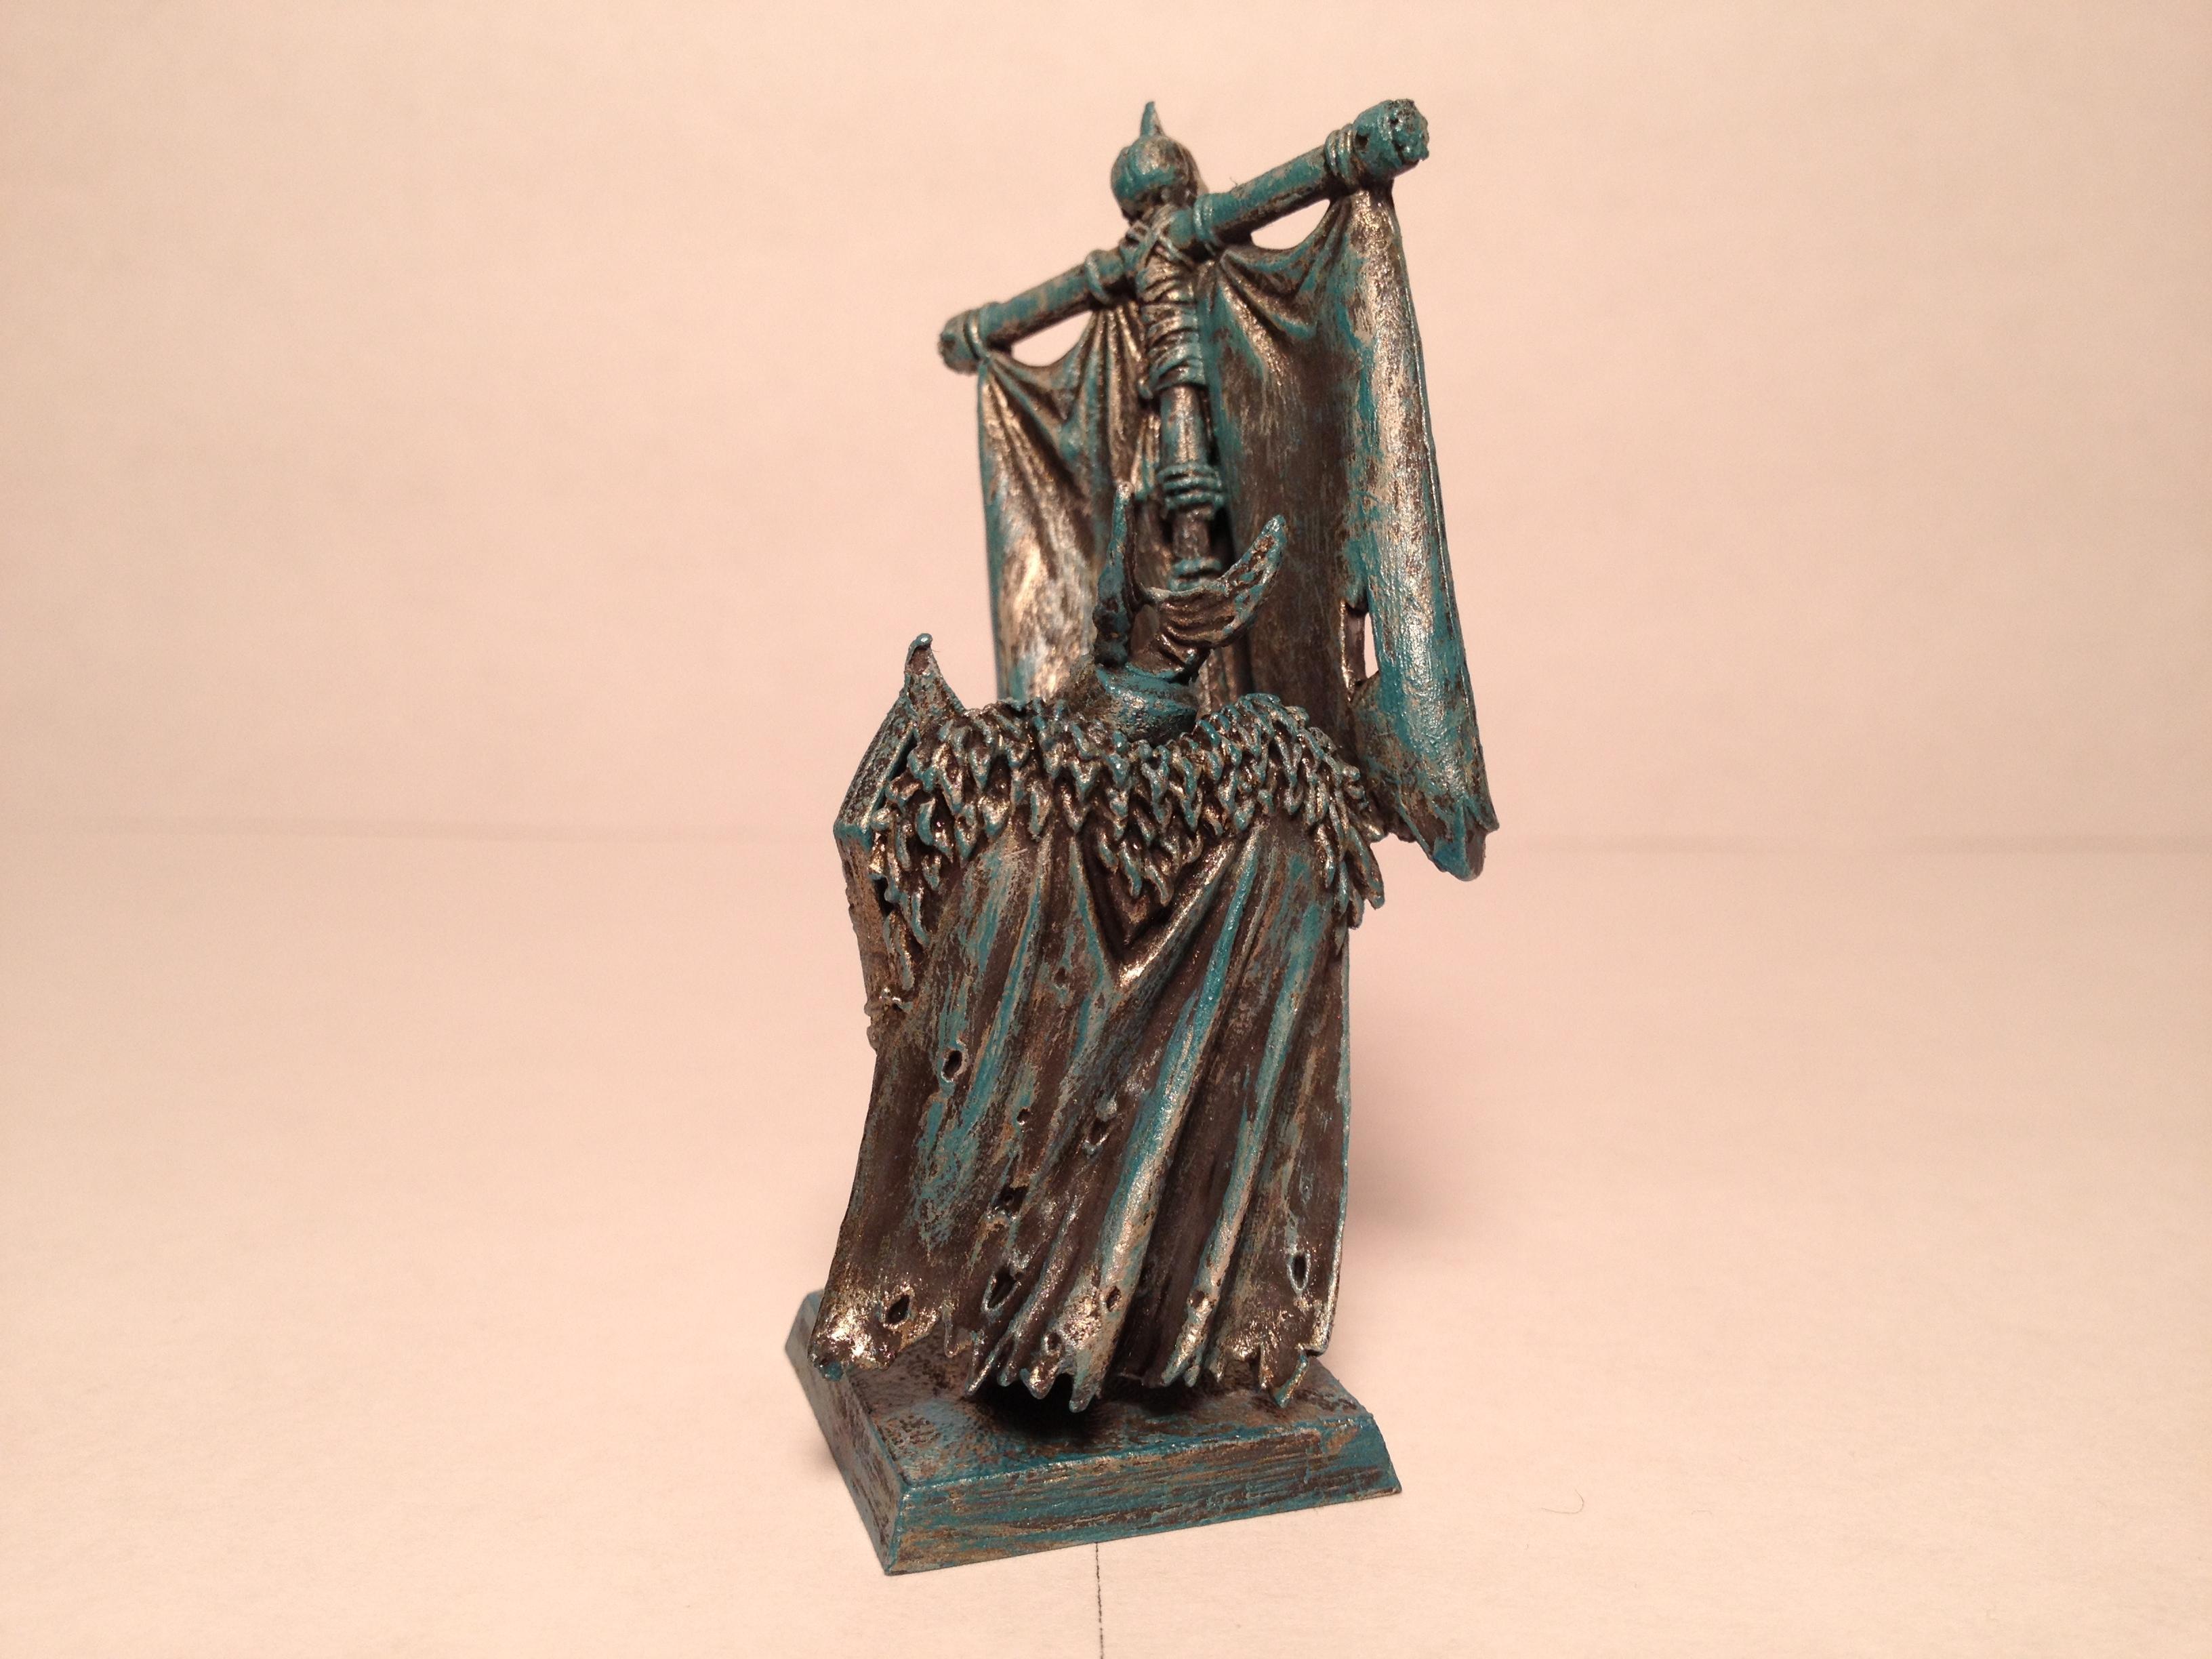 Statue, Chaos Dwarf Statue